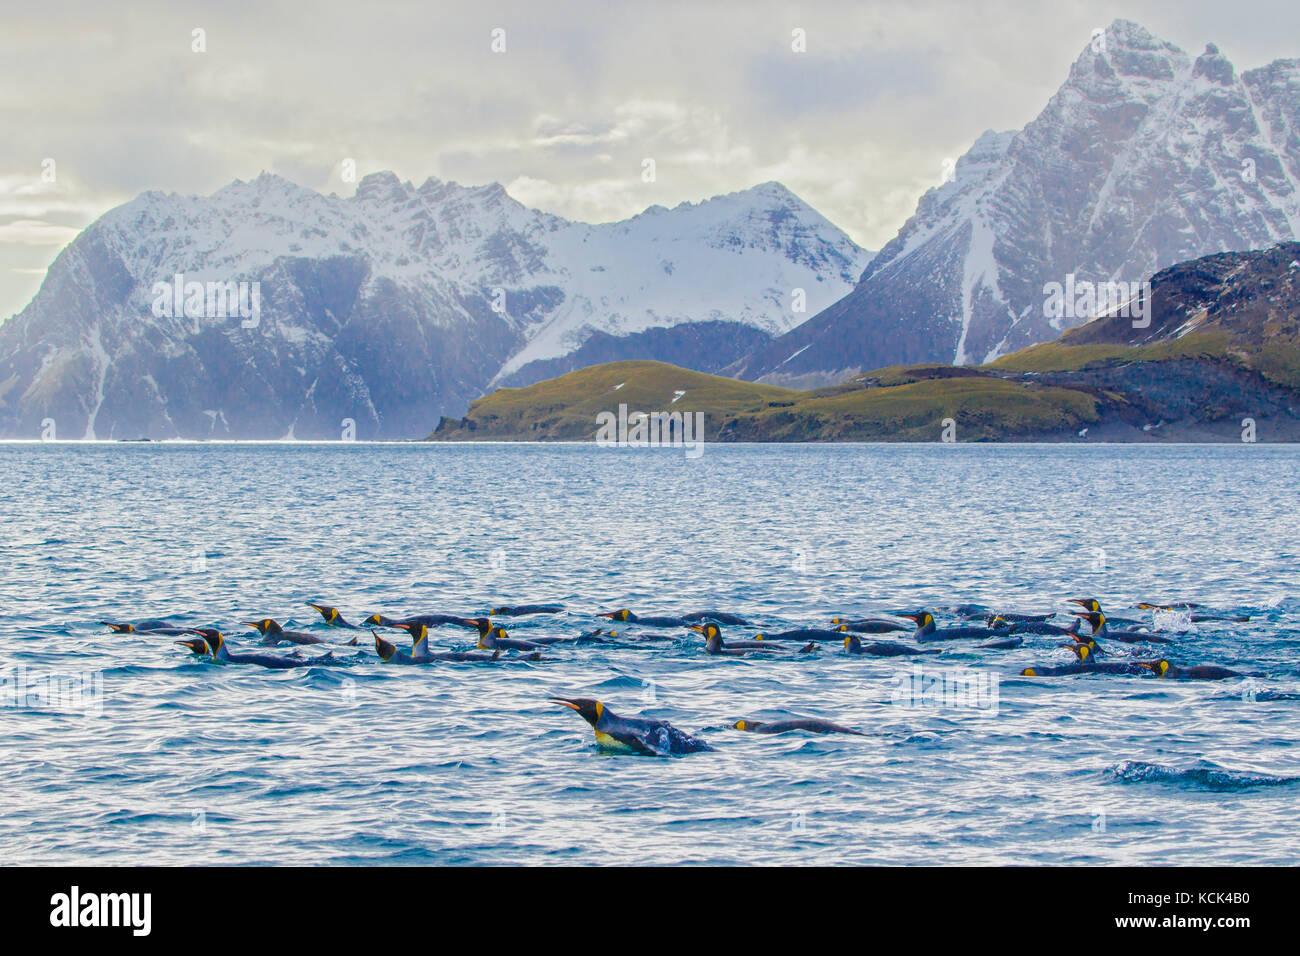 King Penguin (Aptenodytes patagonicus) swimming in the ocean near South Georgia Island. - Stock Image